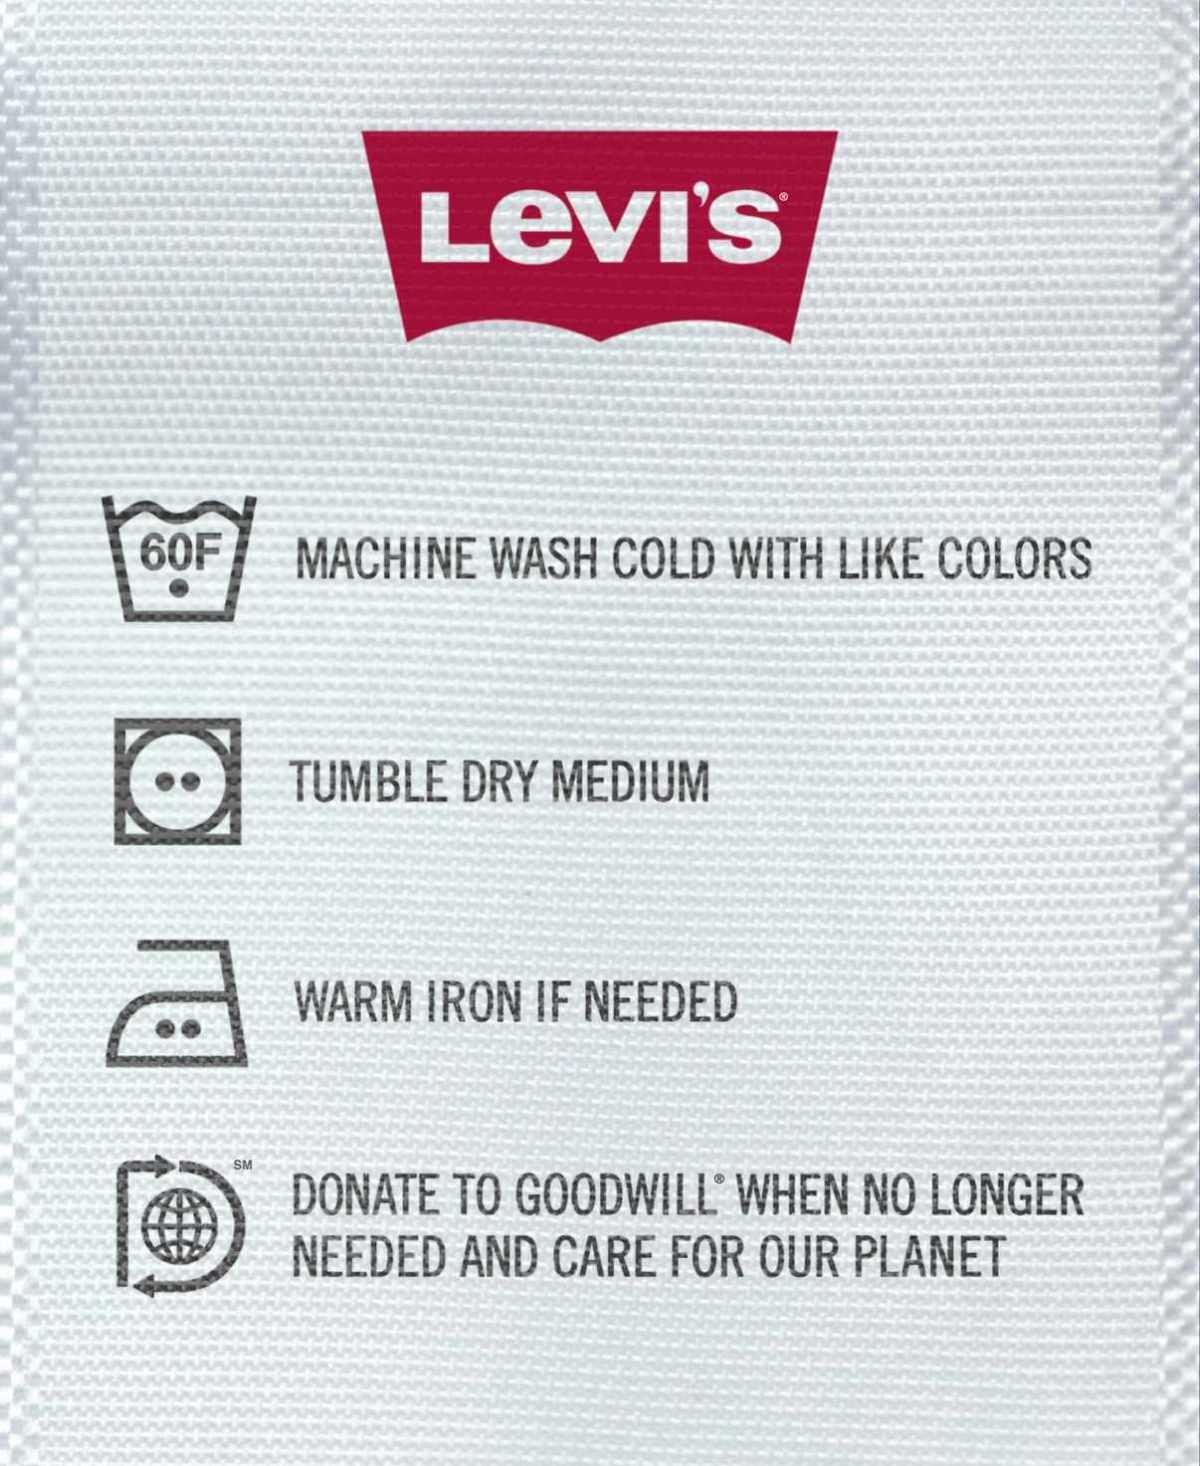 goodwill-levis